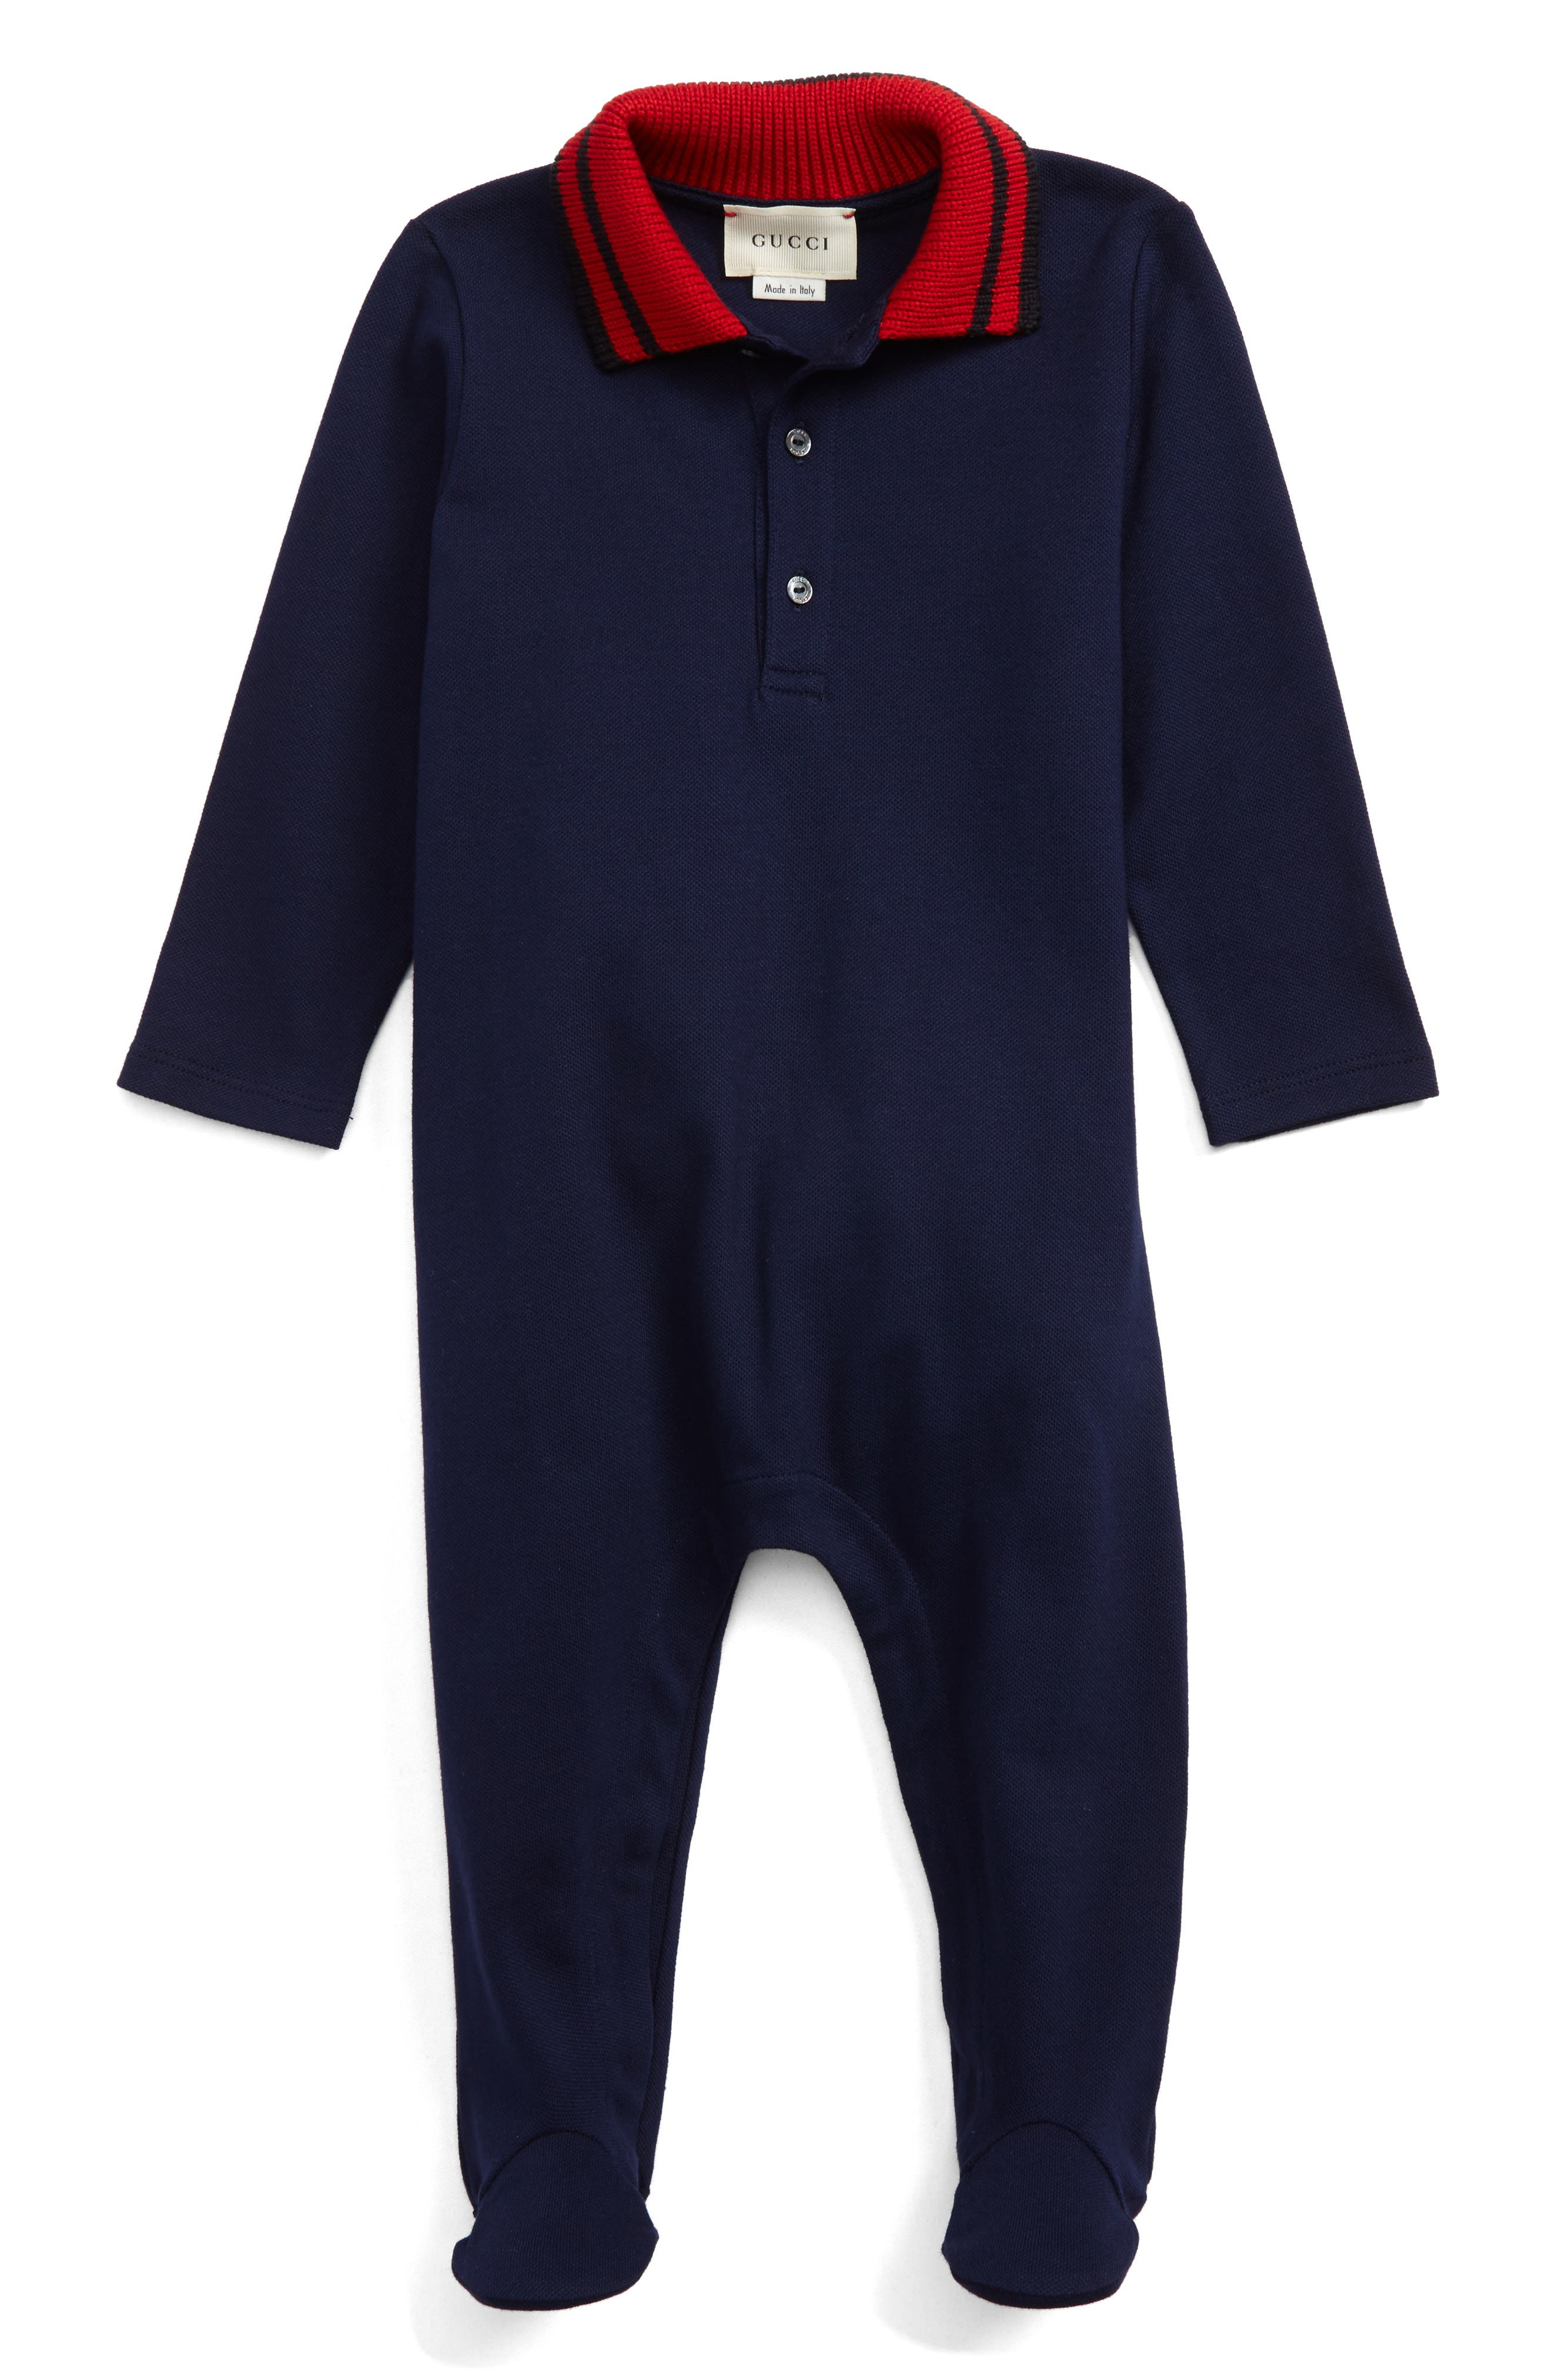 Main Image - Gucci Stripe Collar Footie (Baby)